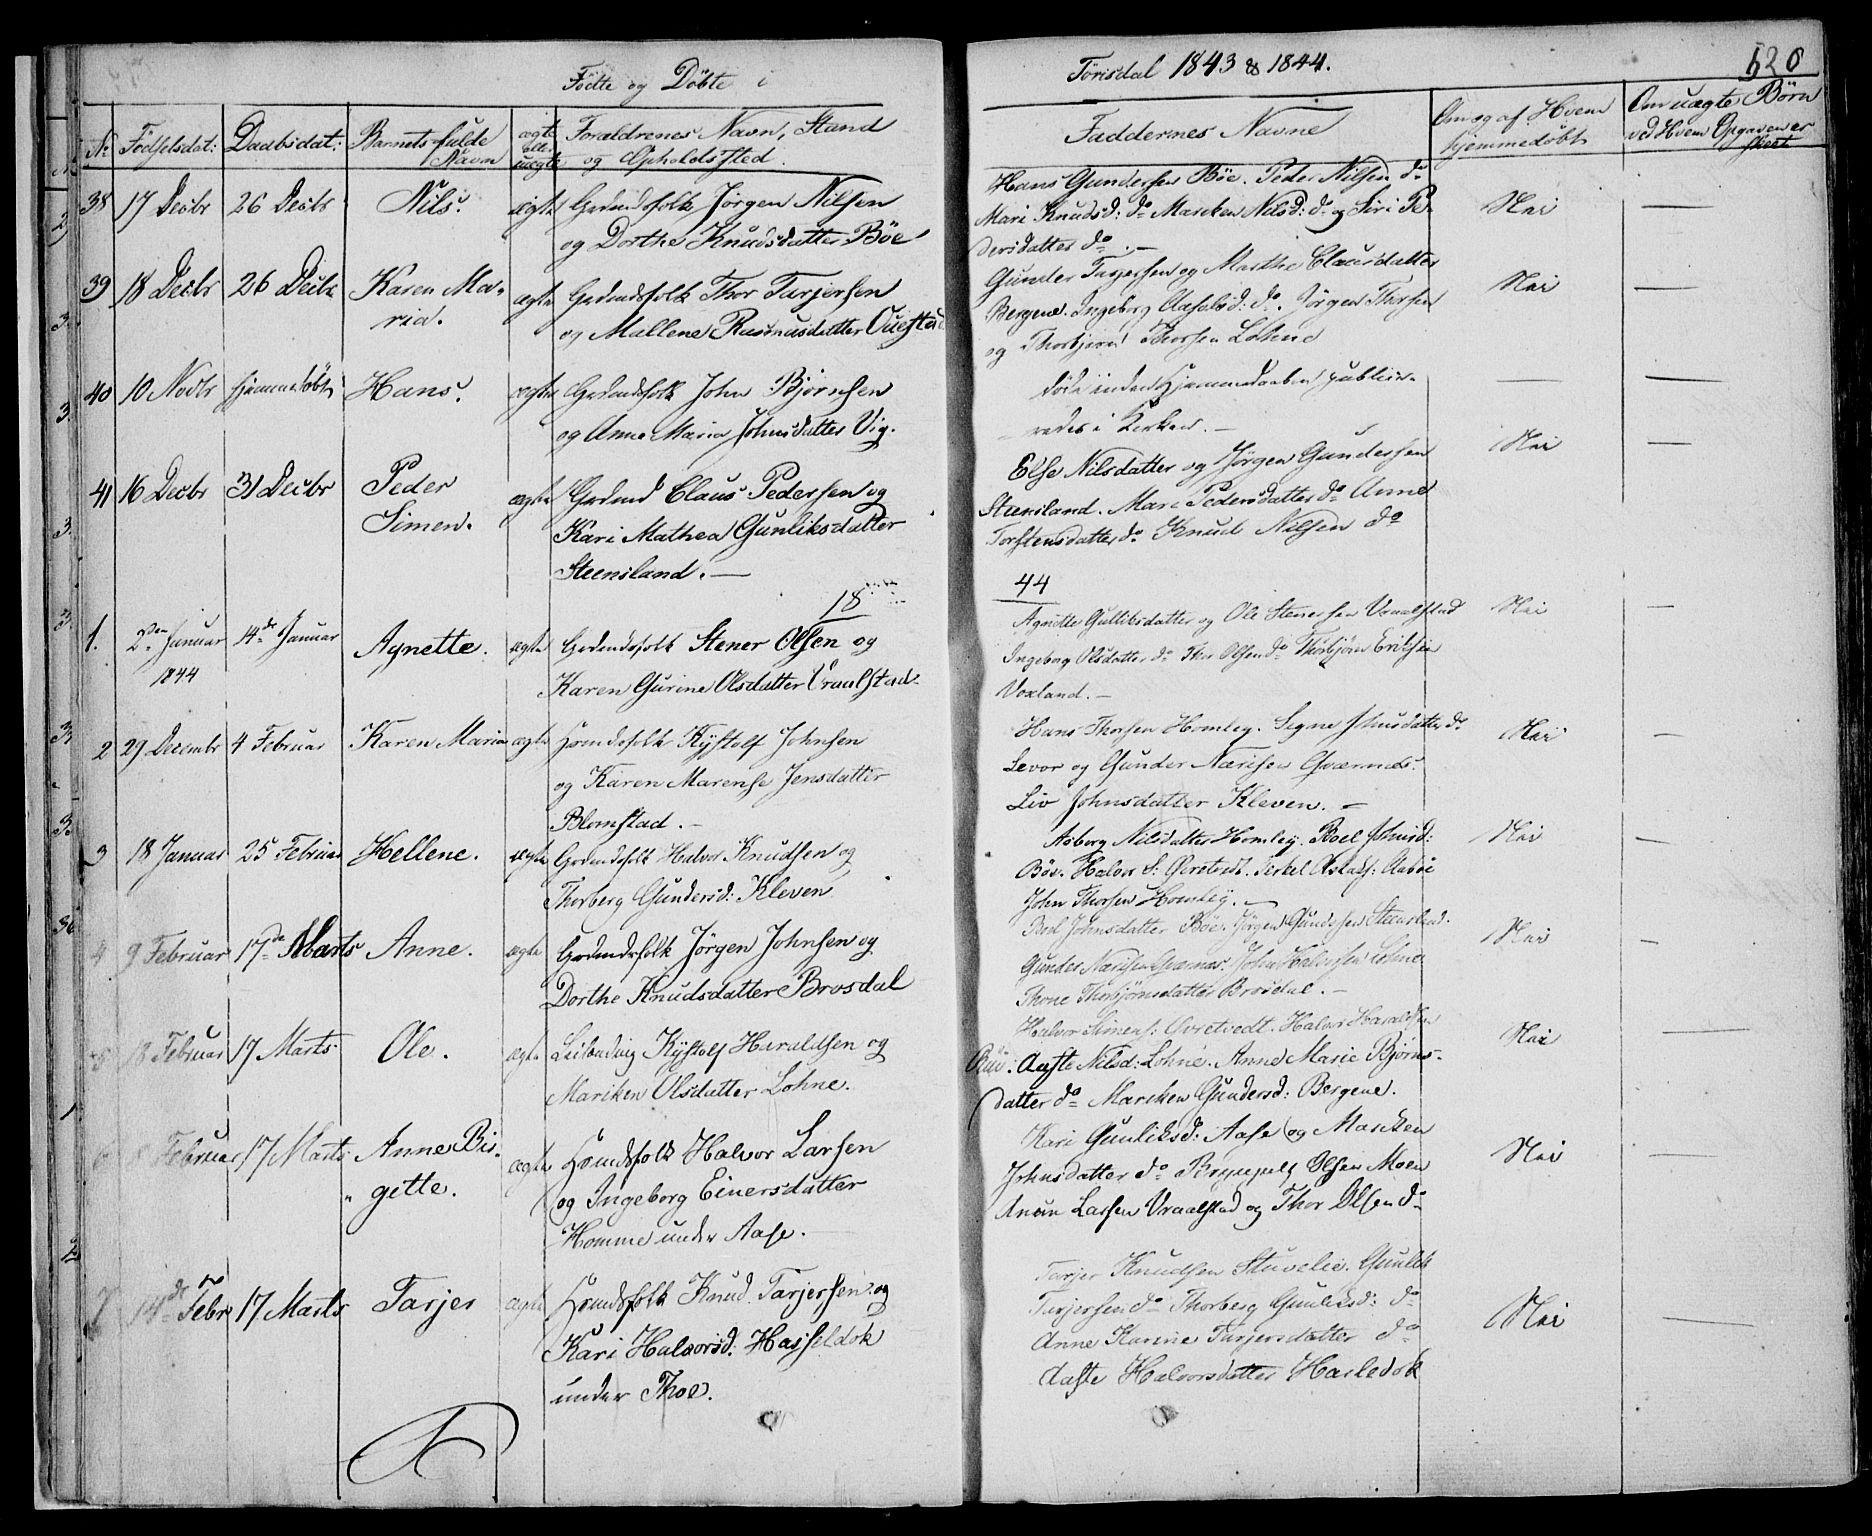 SAKO, Drangedal kirkebøker, F/Fa/L0007b: Ministerialbok nr. 7b, 1837-1856, s. 520